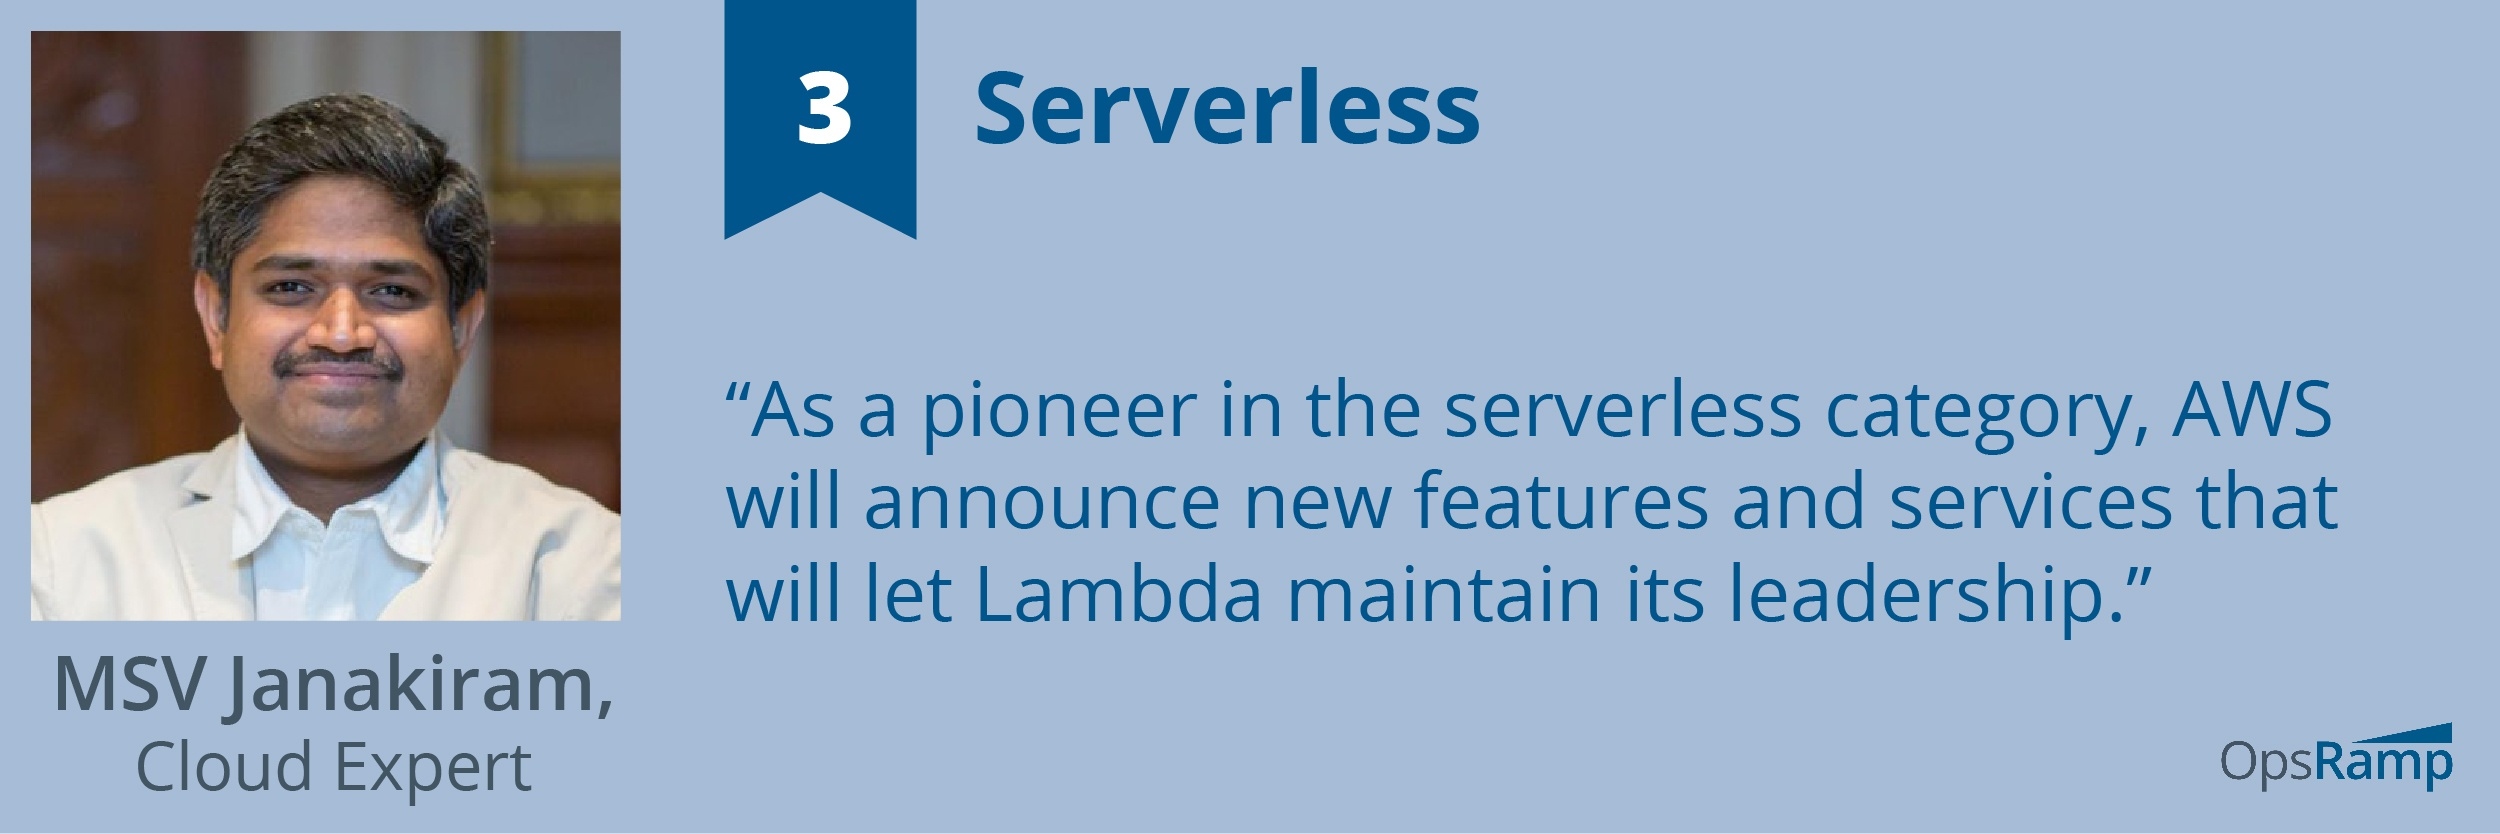 New Enhancements Coming To Lambda